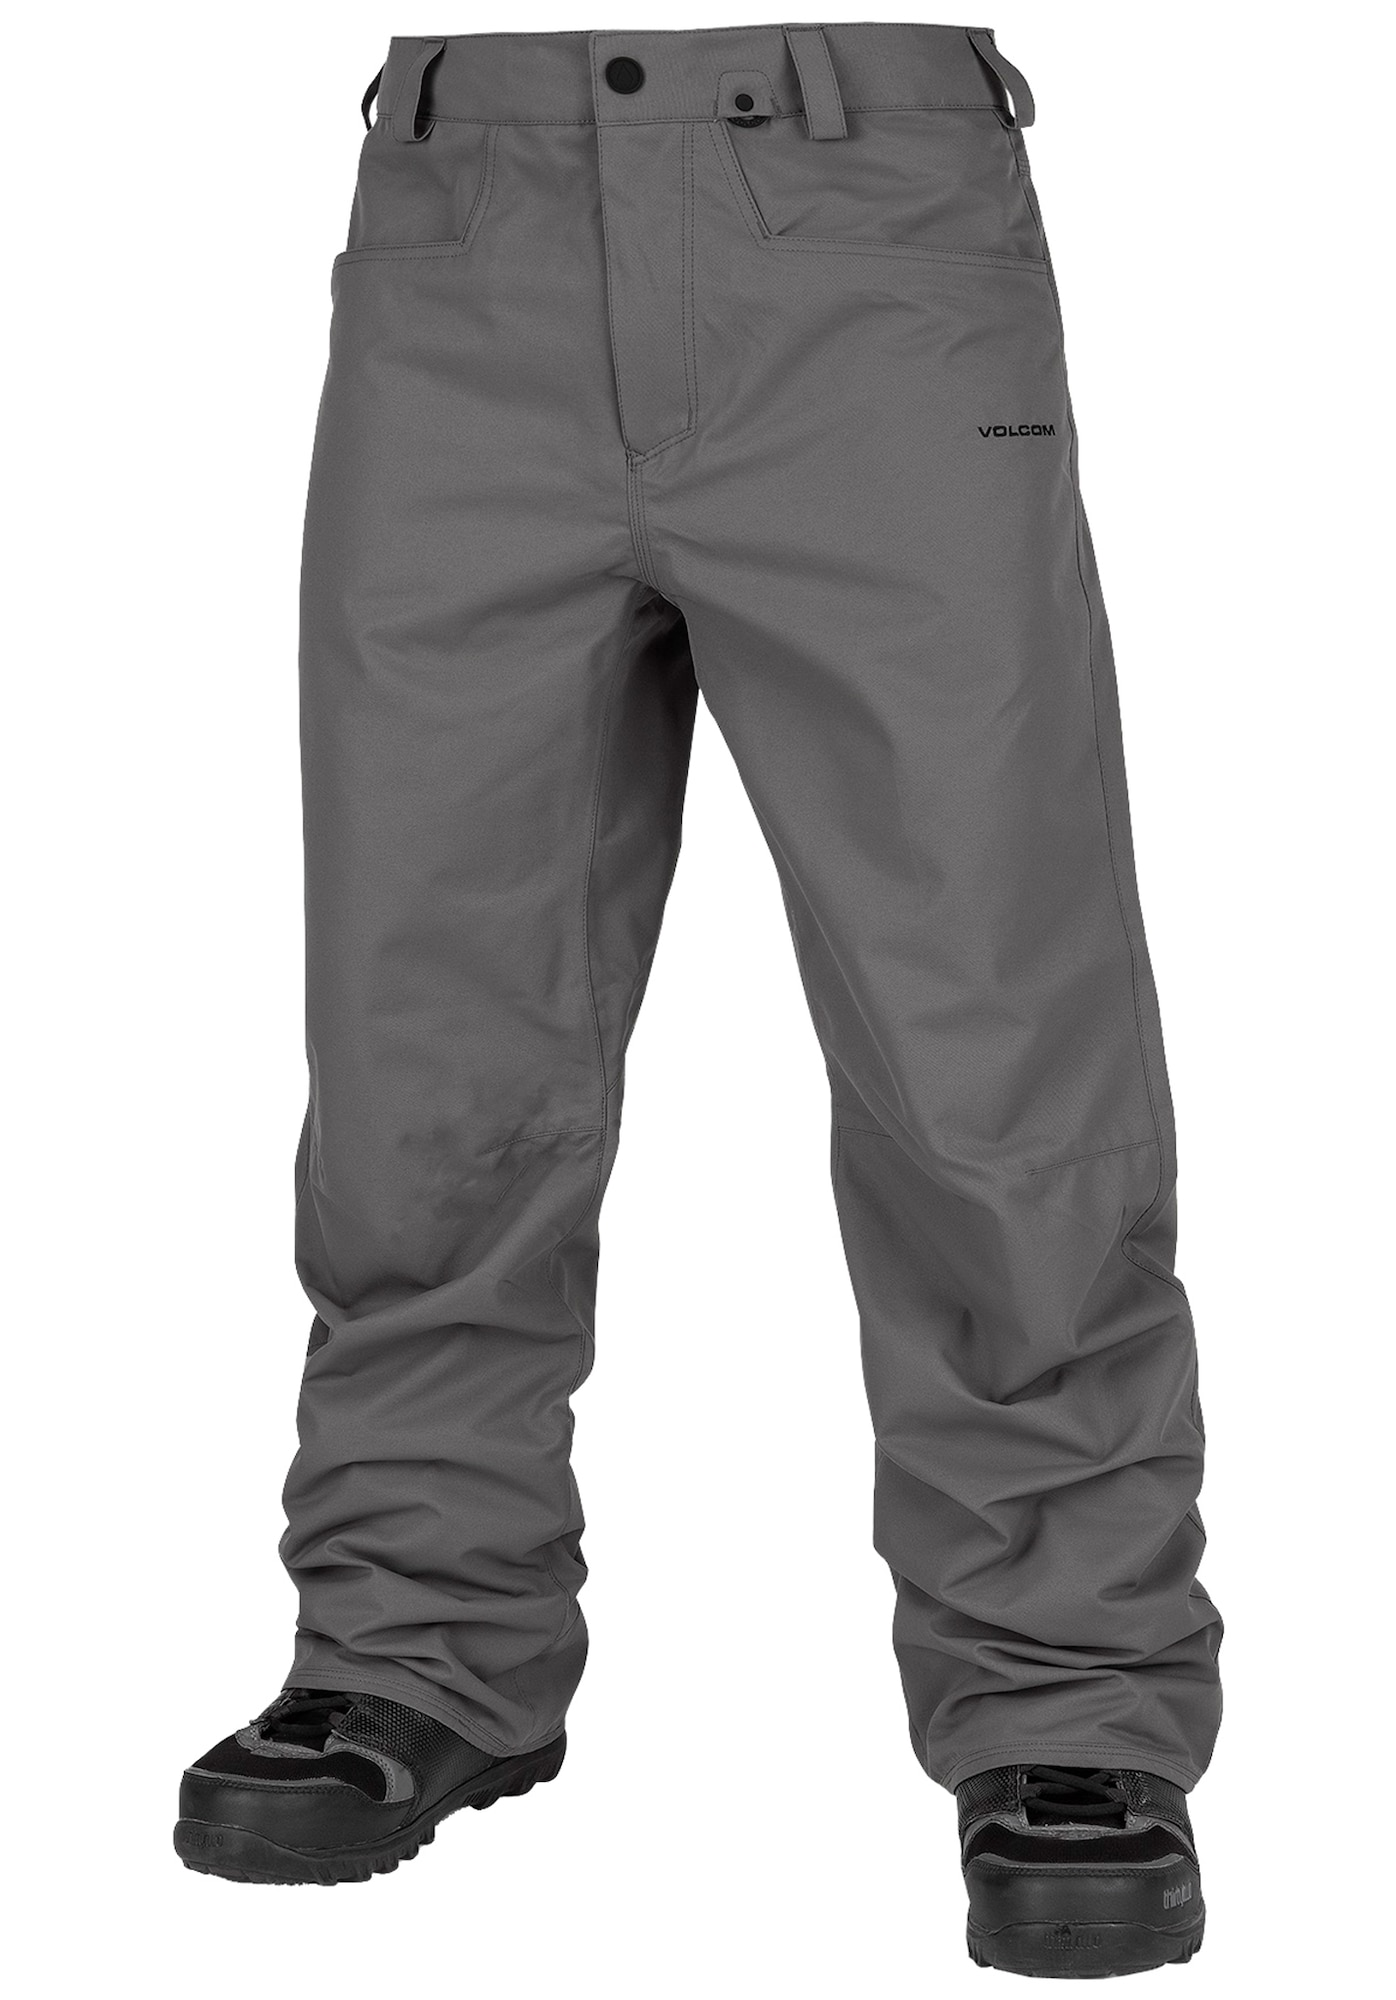 Snowboardhose 'Carbon' | Sportbekleidung > Sporthosen > Snowboardhosen | Grau | Volcom